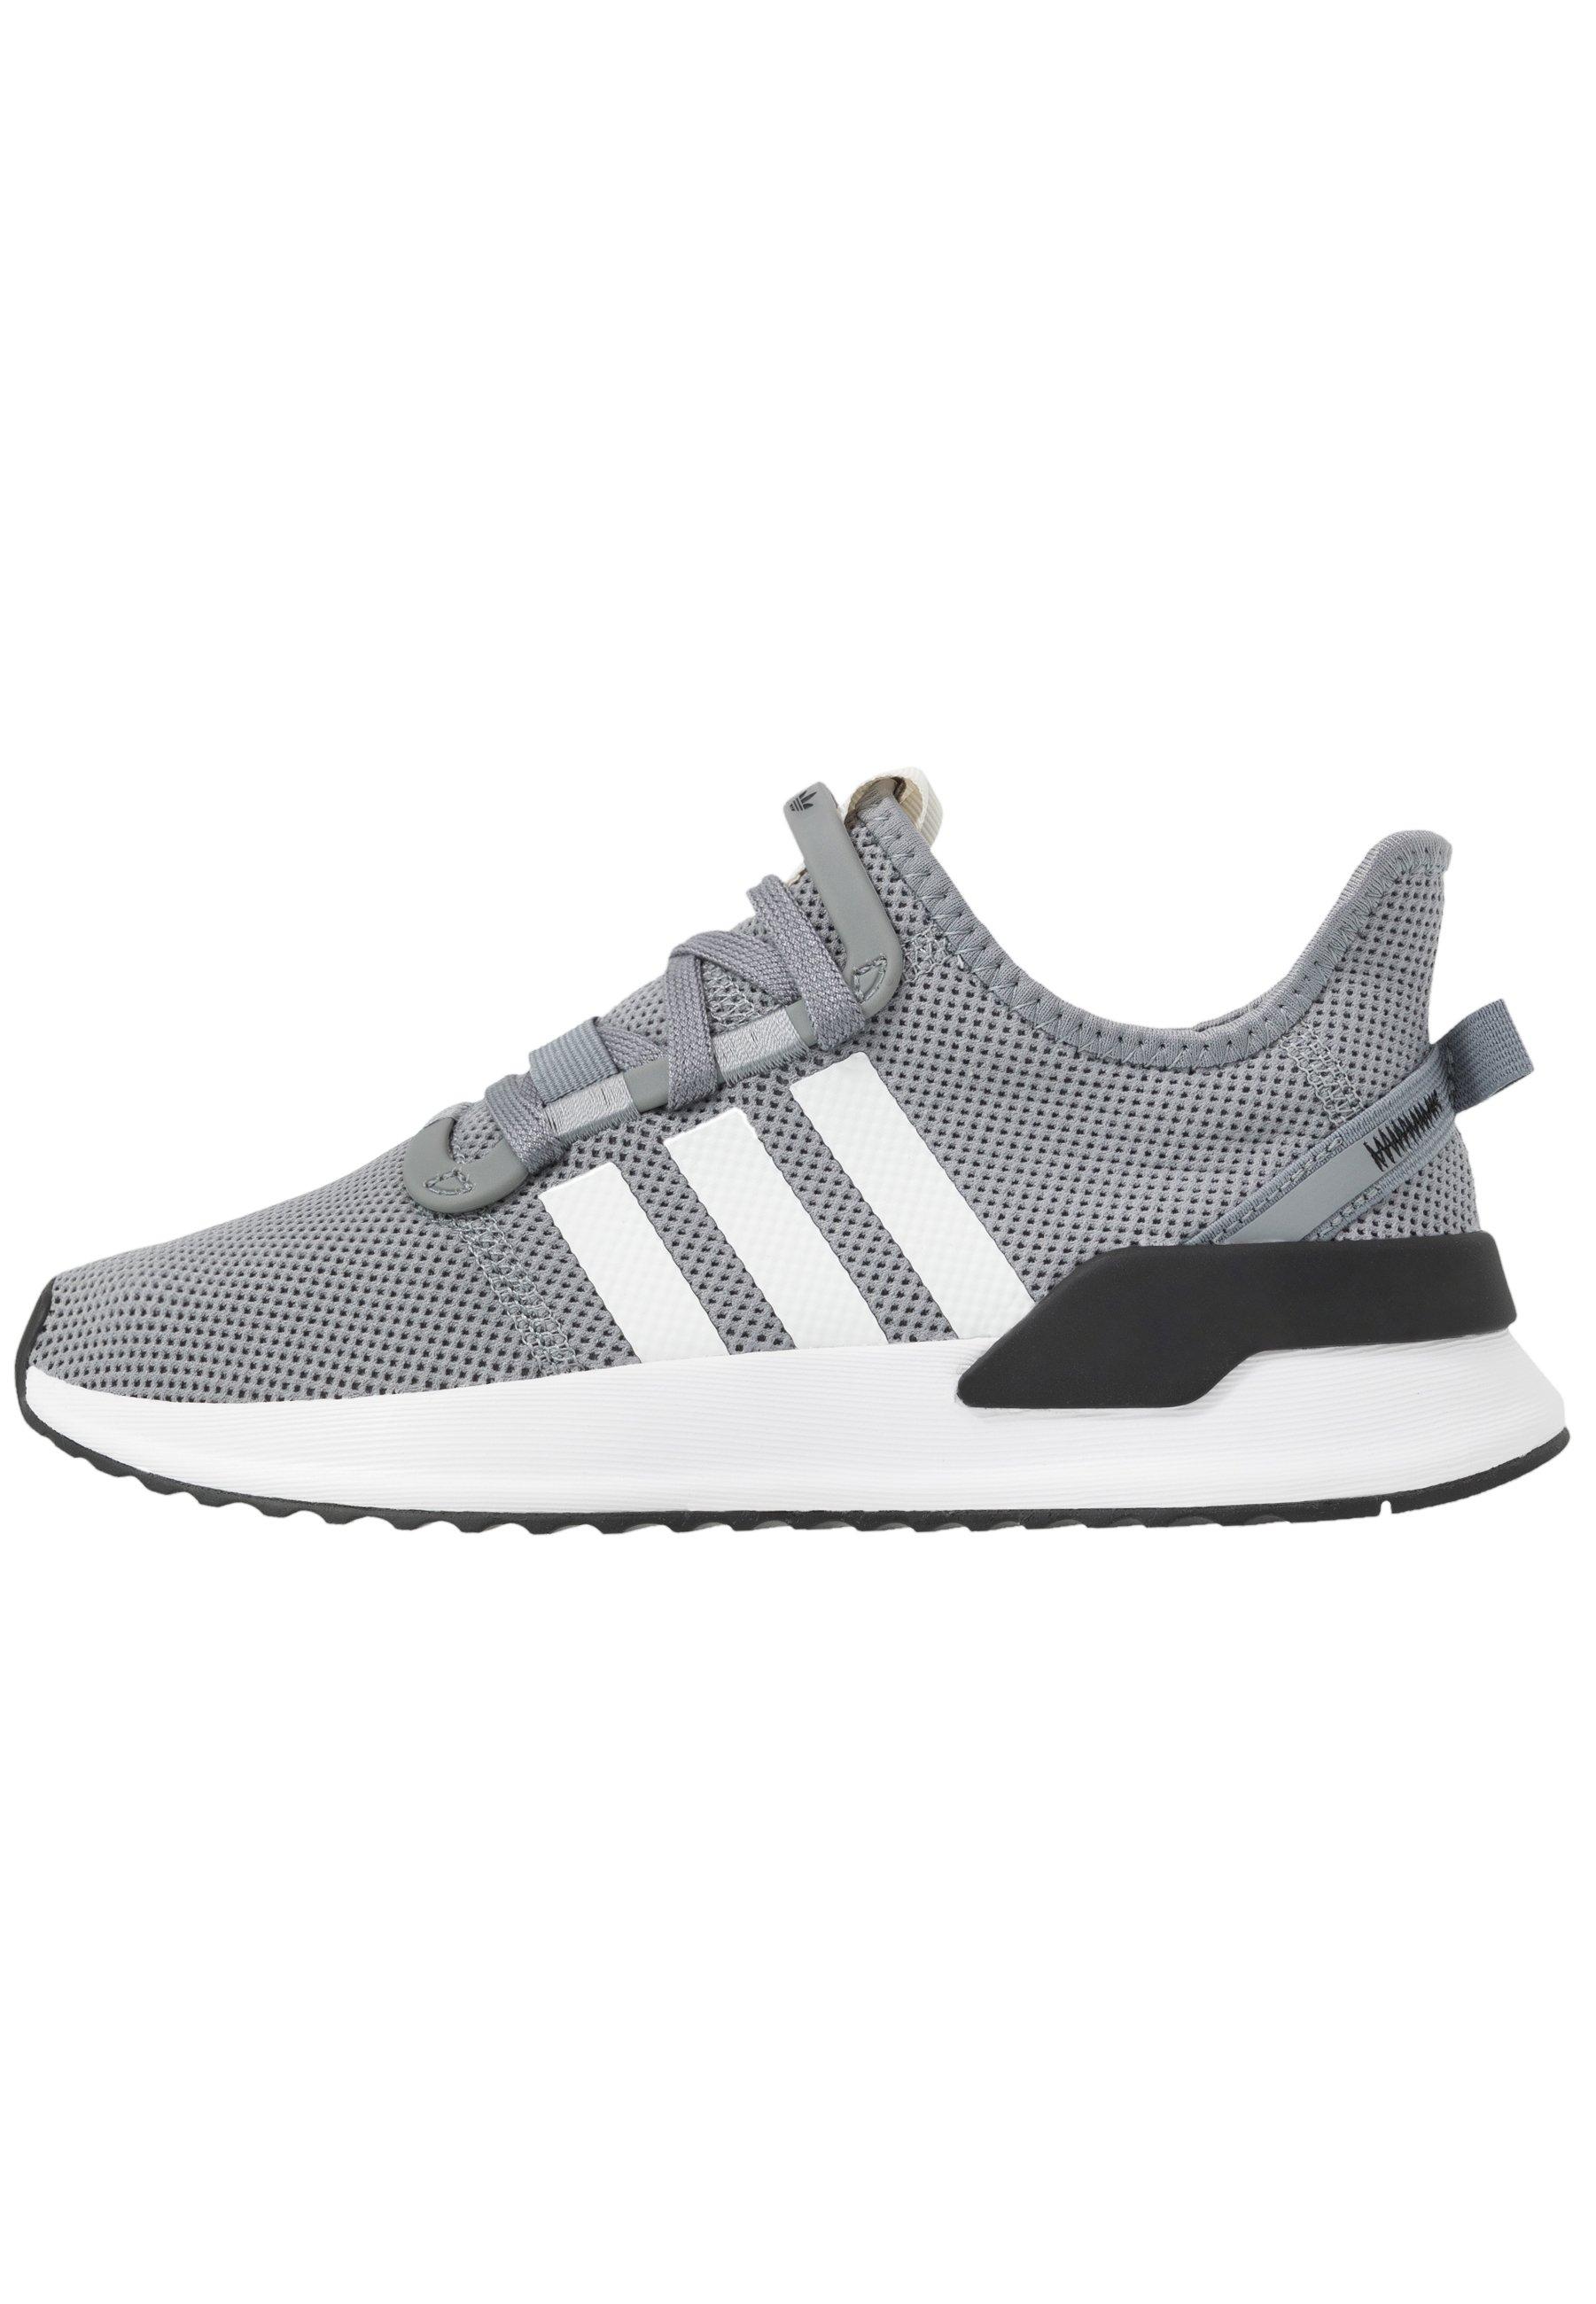 adidas Originals U_PATH RUN Sneaker low greyfootwear